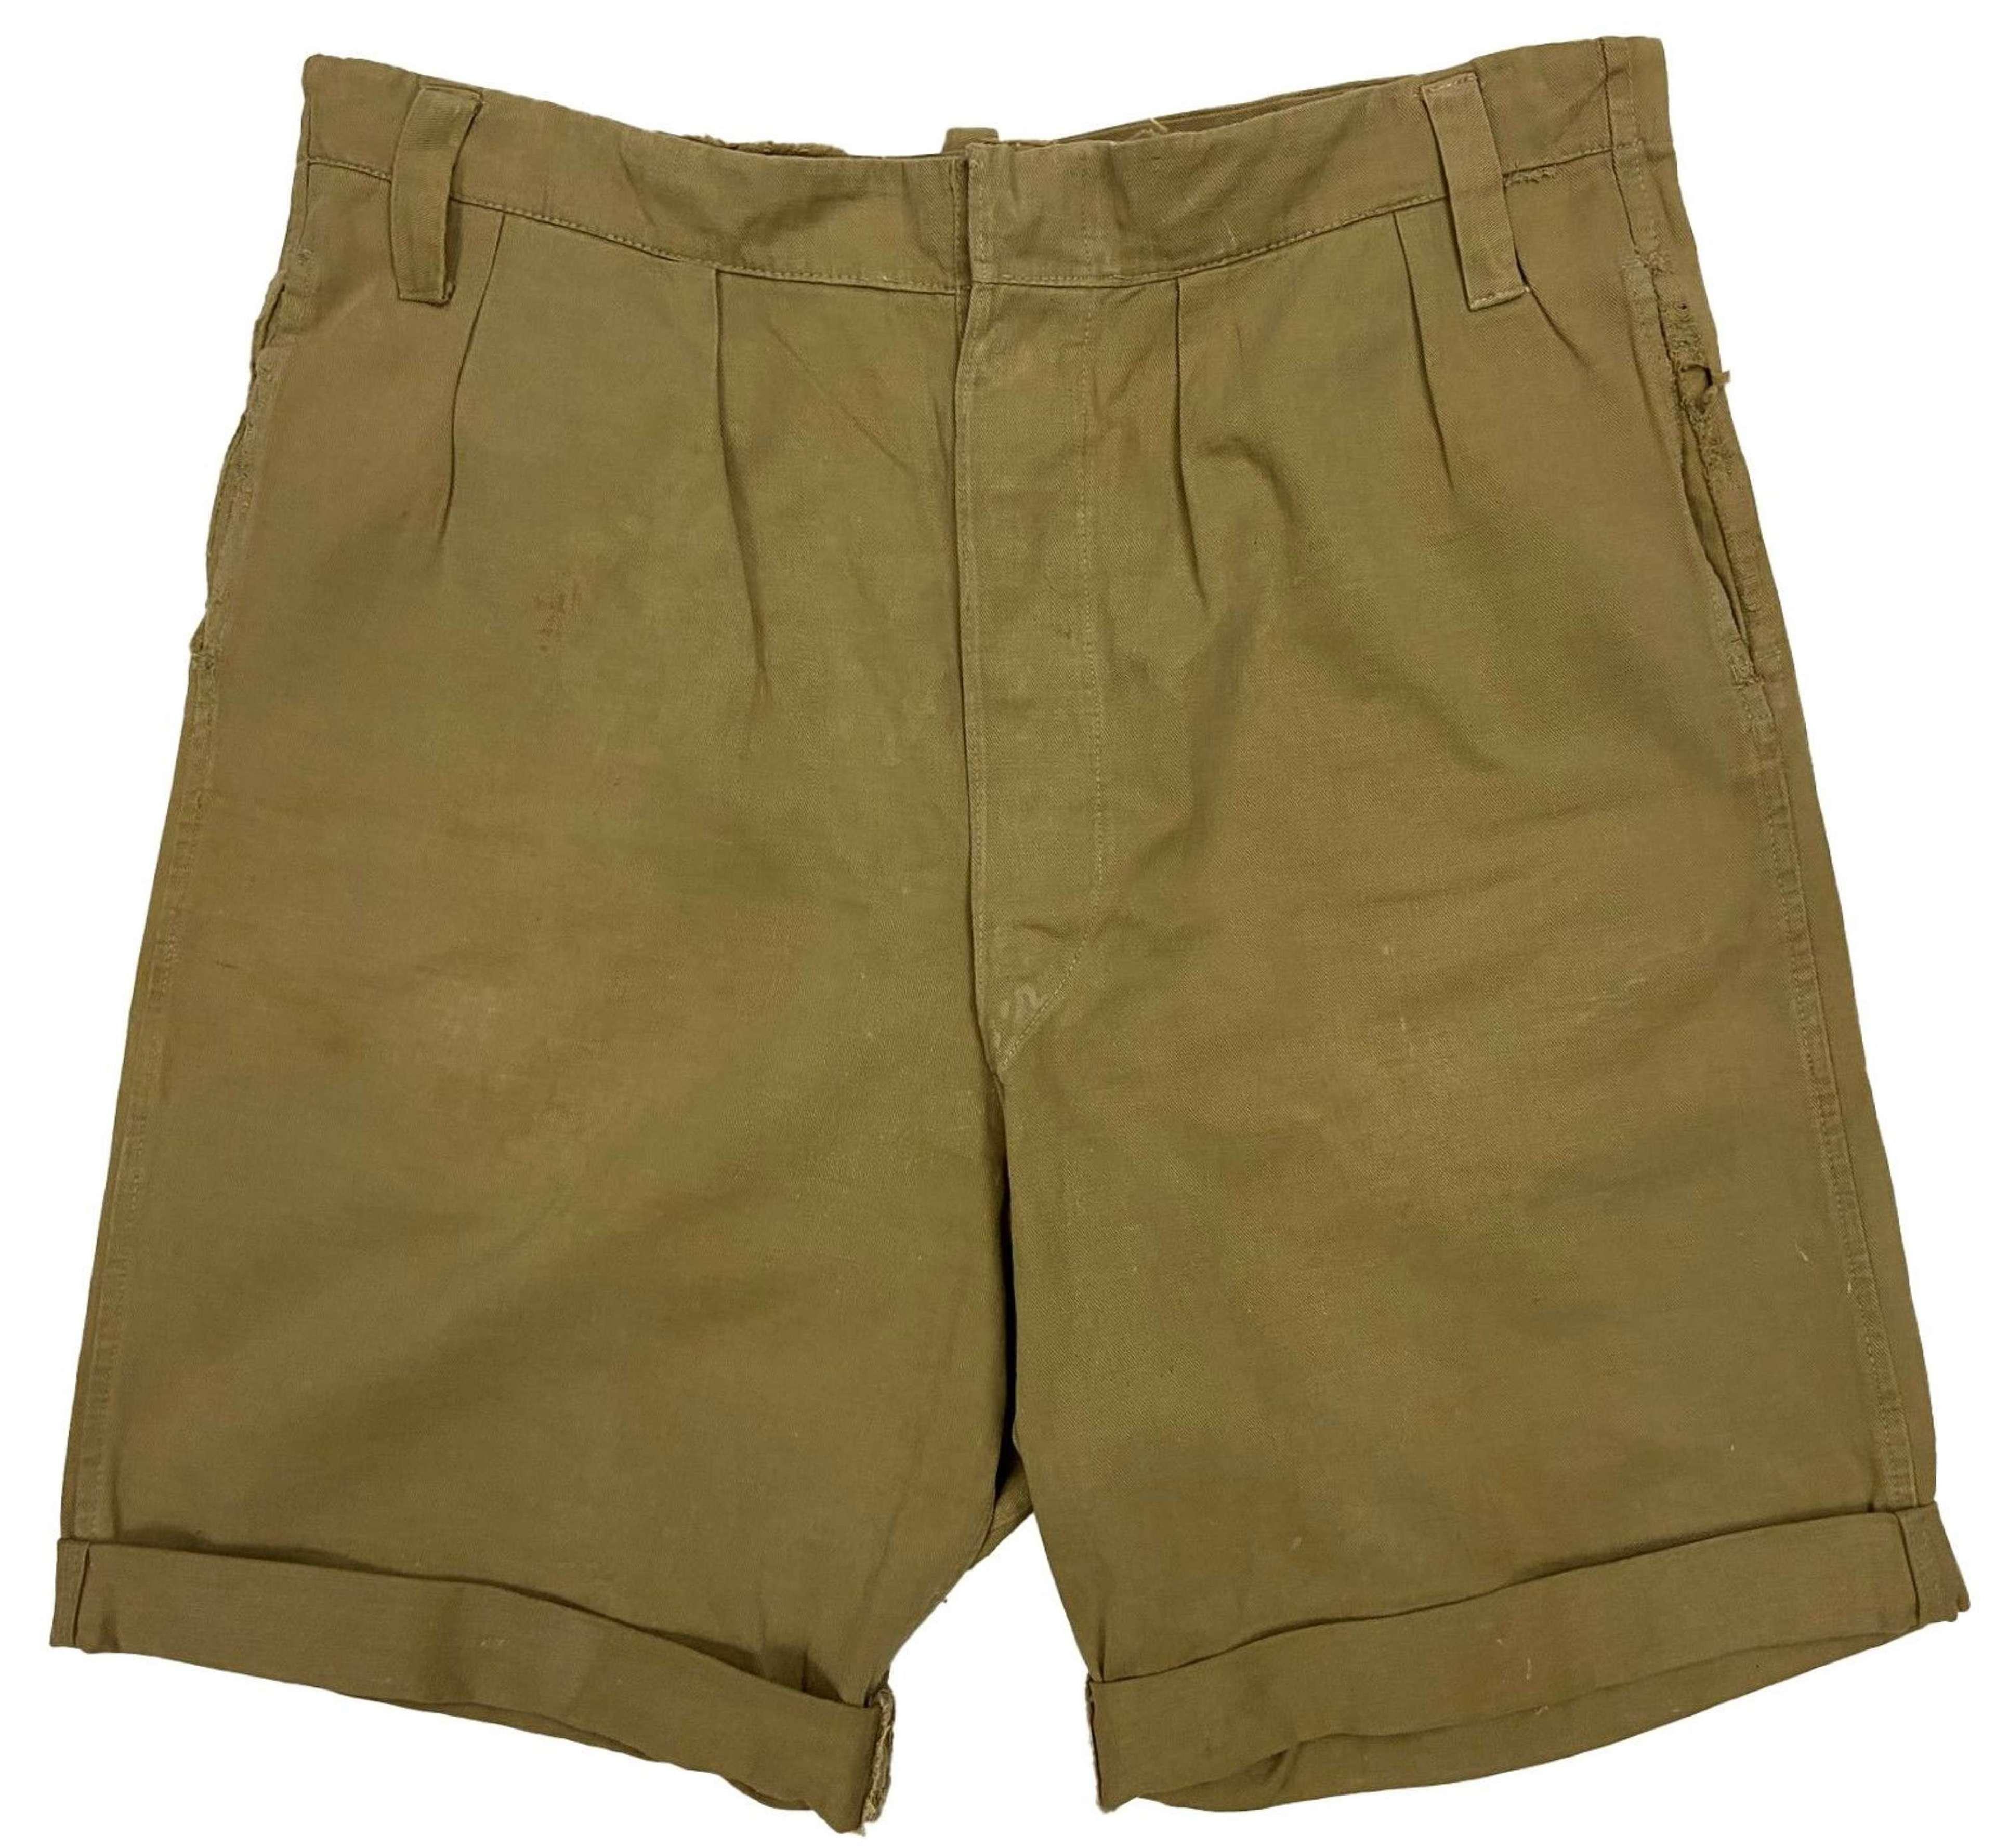 Original 1940s British Military Khaki Drill Shorts